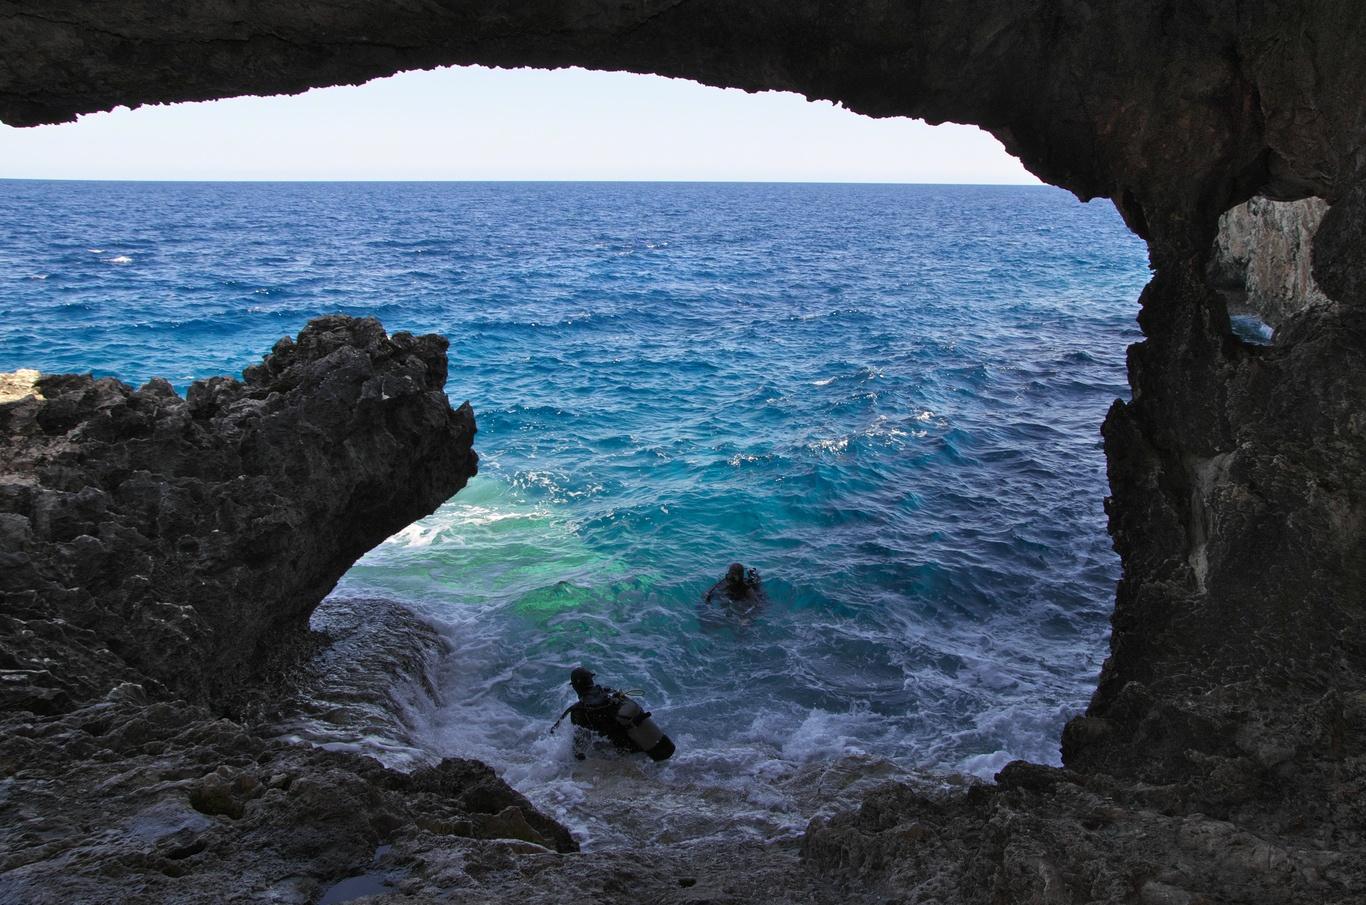 Mys Greco, jeskyně Ayioi Anargyroi